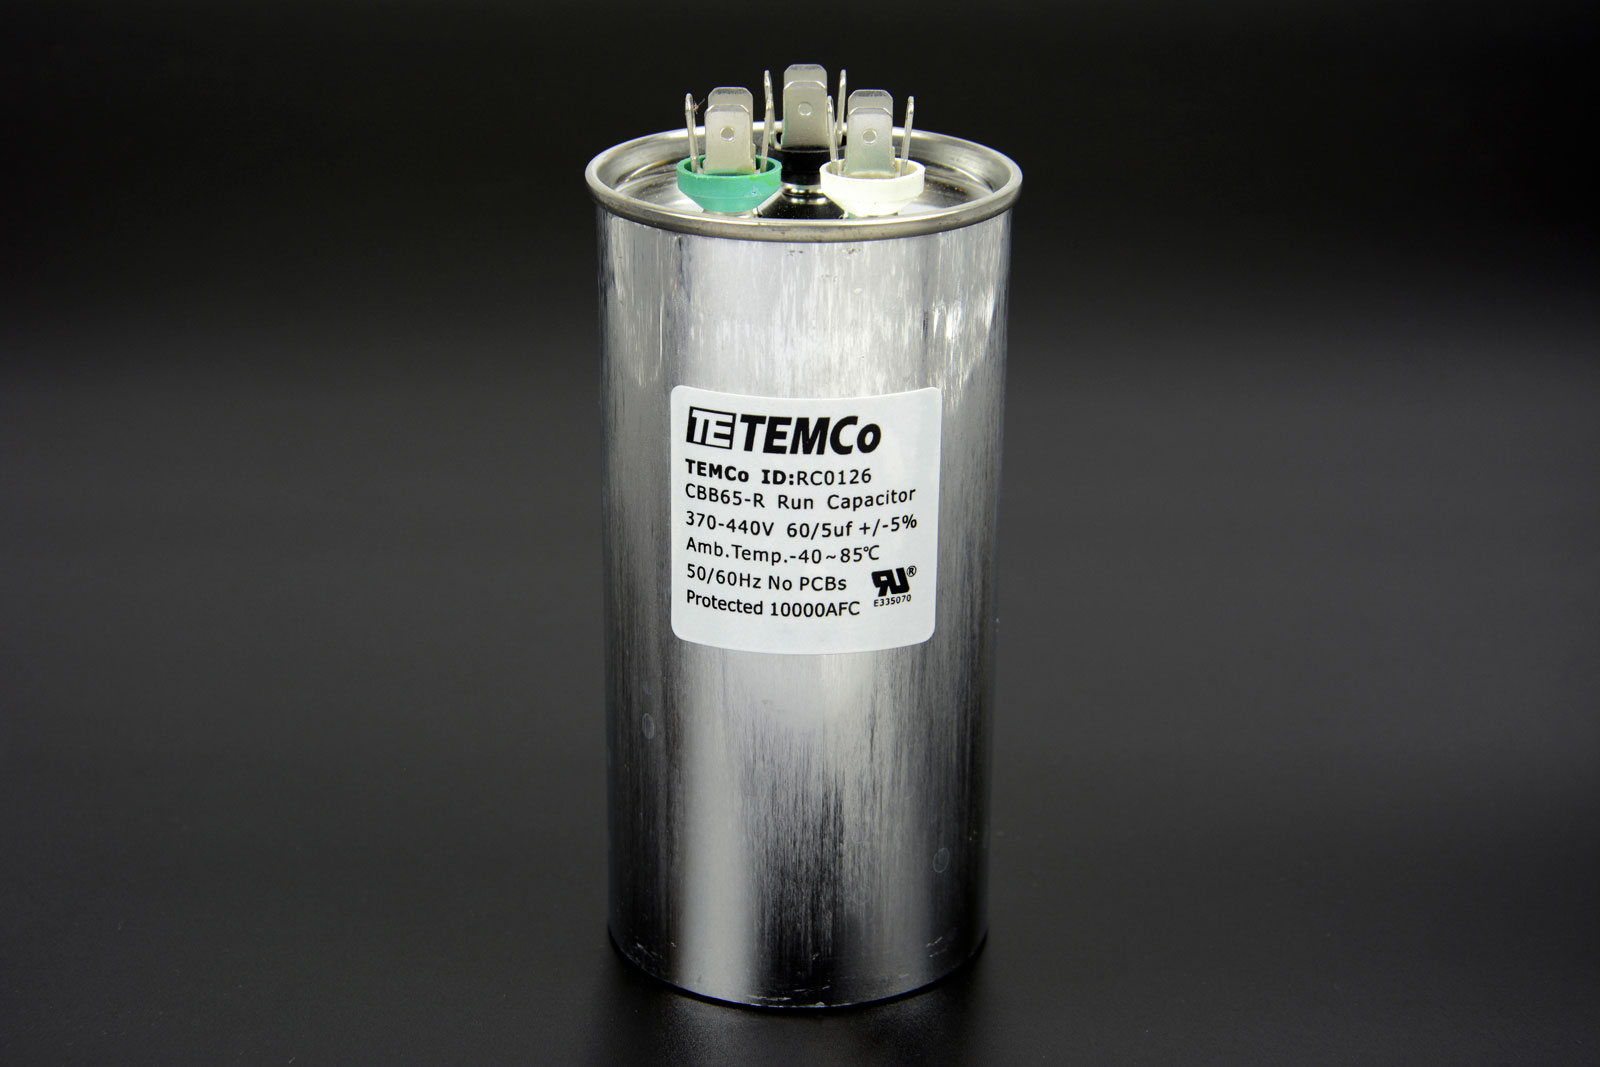 Temco 60 5 Mfd Uf Dual Run Capacitor 370 440 Vac Volts Ac